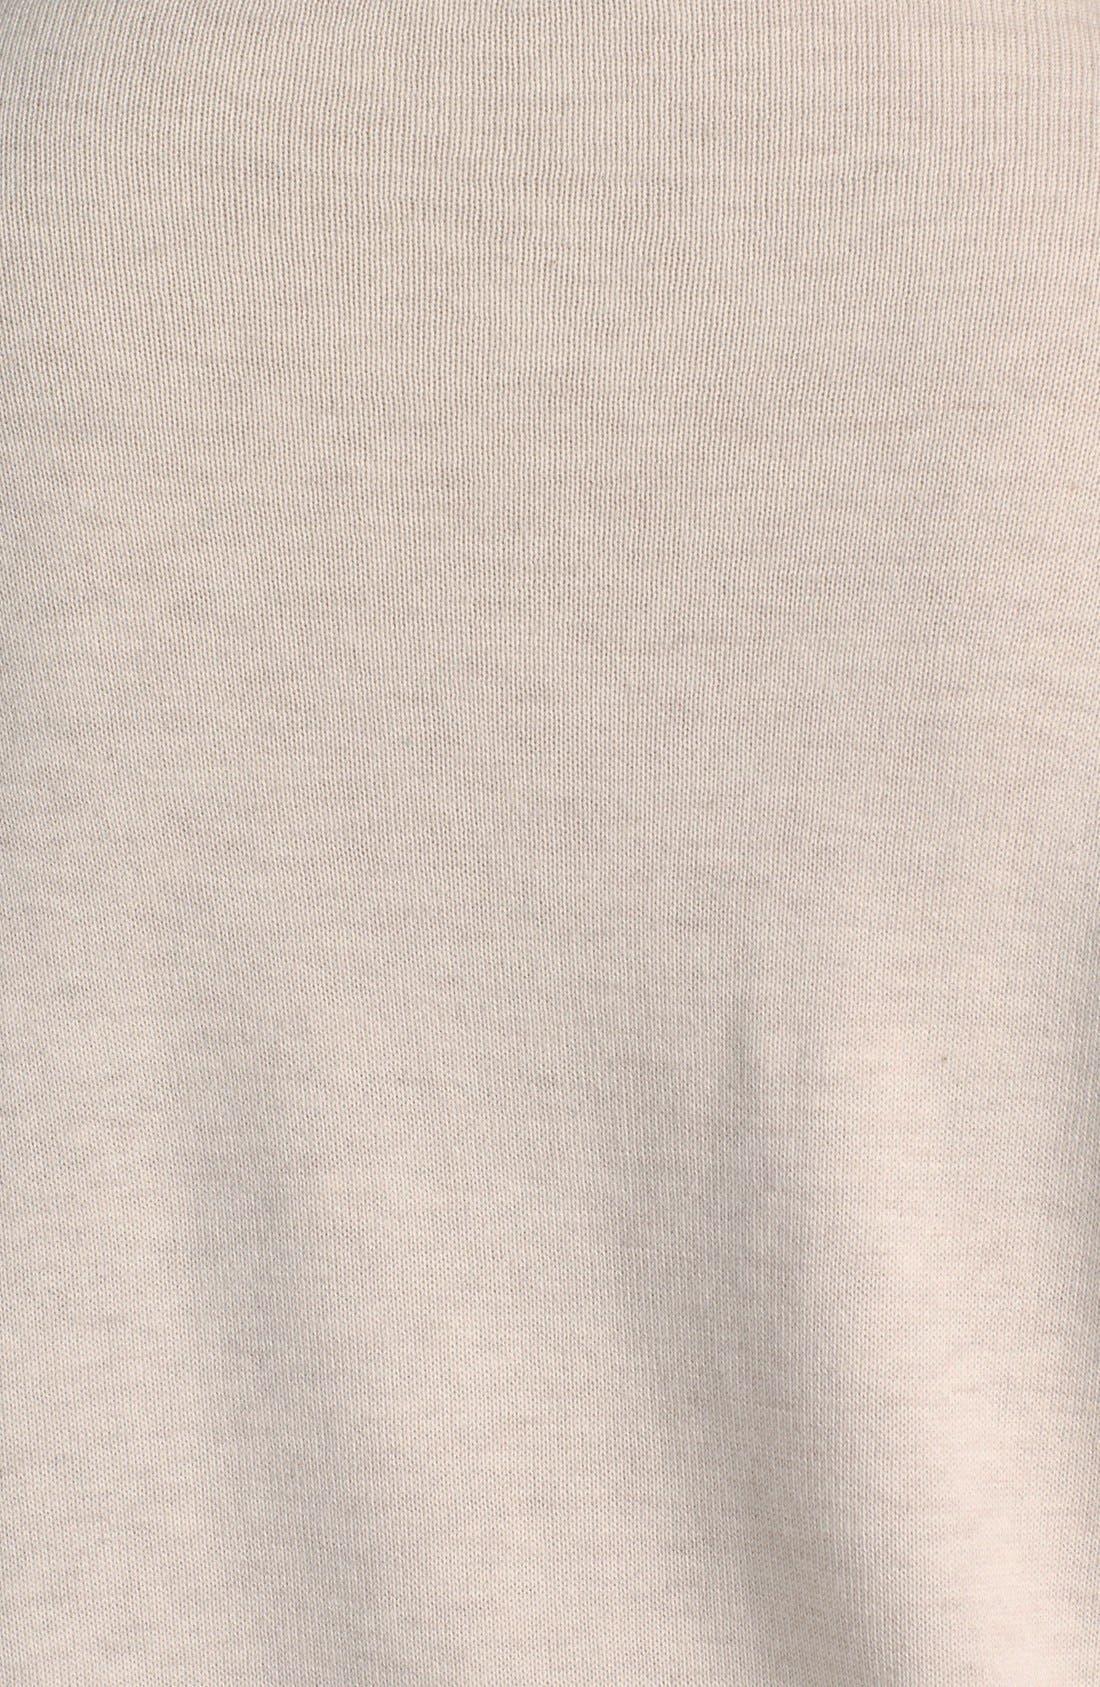 Intarsia Crewneck Sweater,                             Alternate thumbnail 6, color,